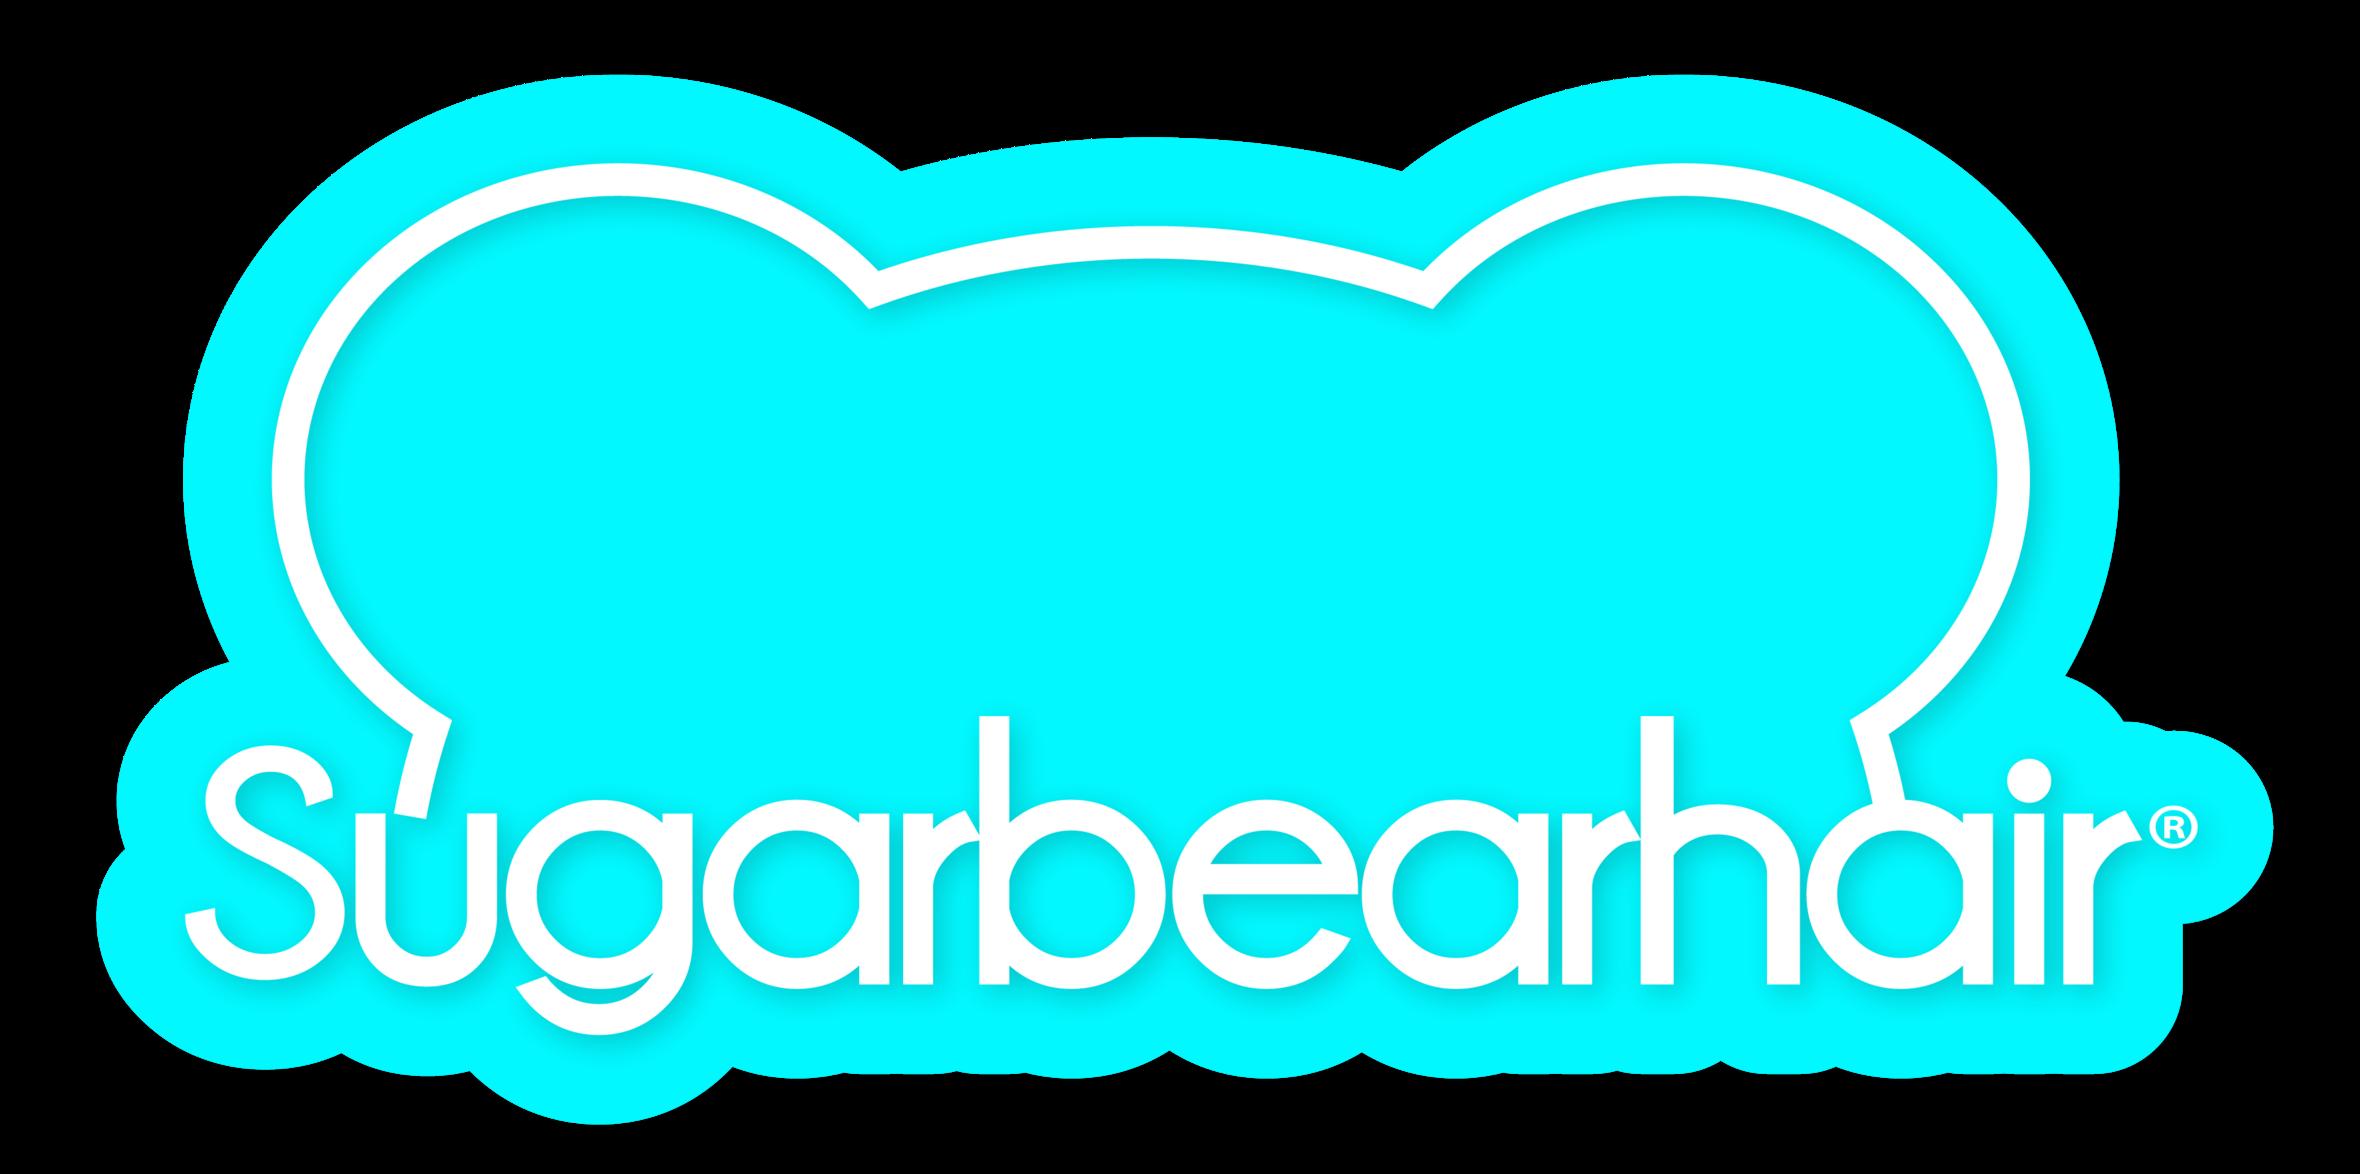 Sugar Bear Hair Coupons